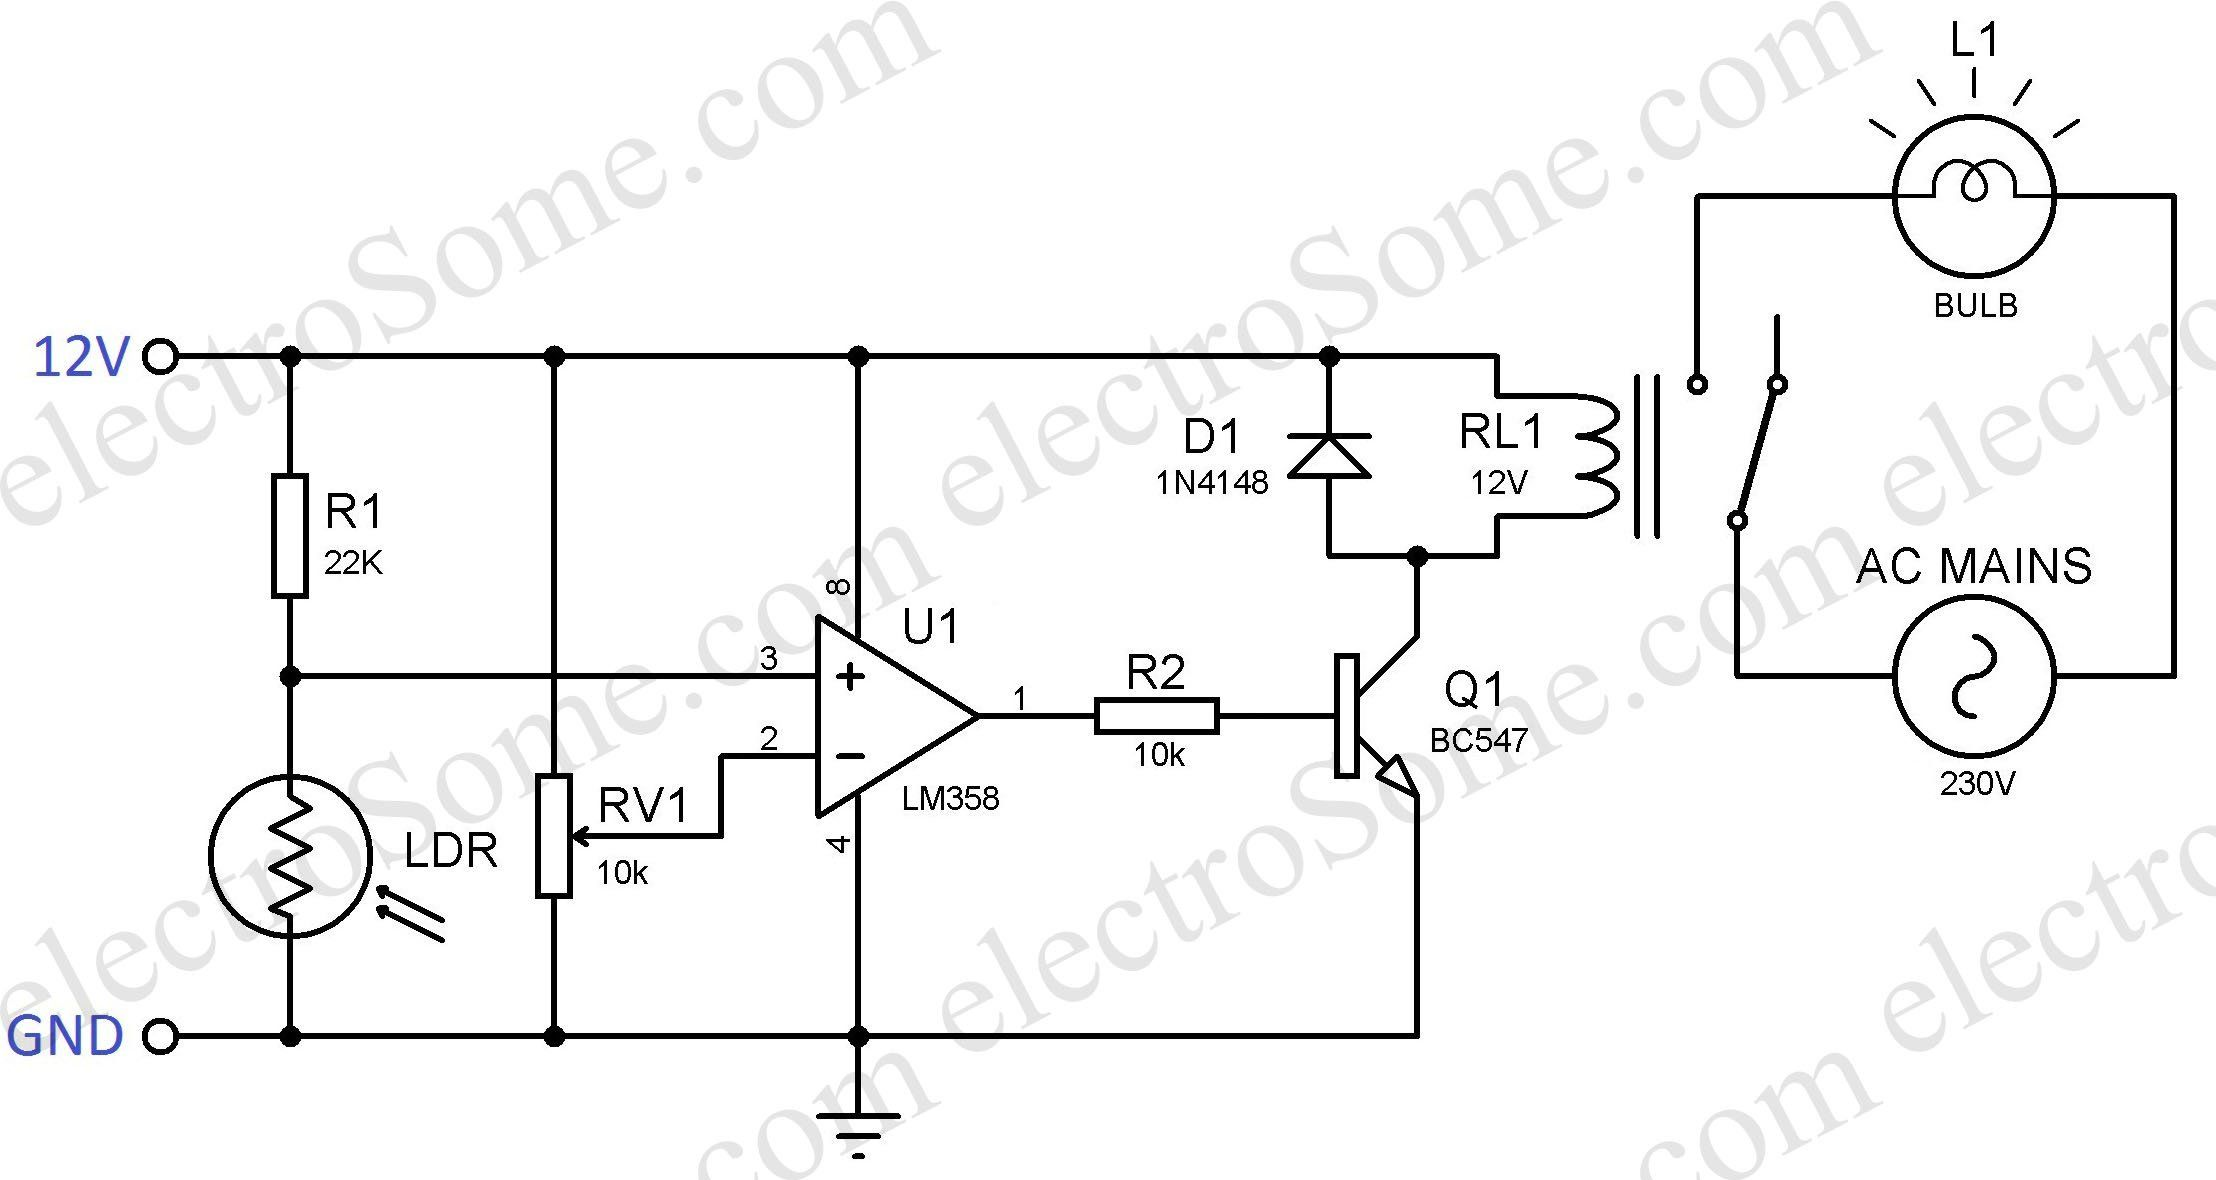 small resolution of solar street light block diagram solar street light circuit diagram solar led night light circuit diagram power supply block diagram joule